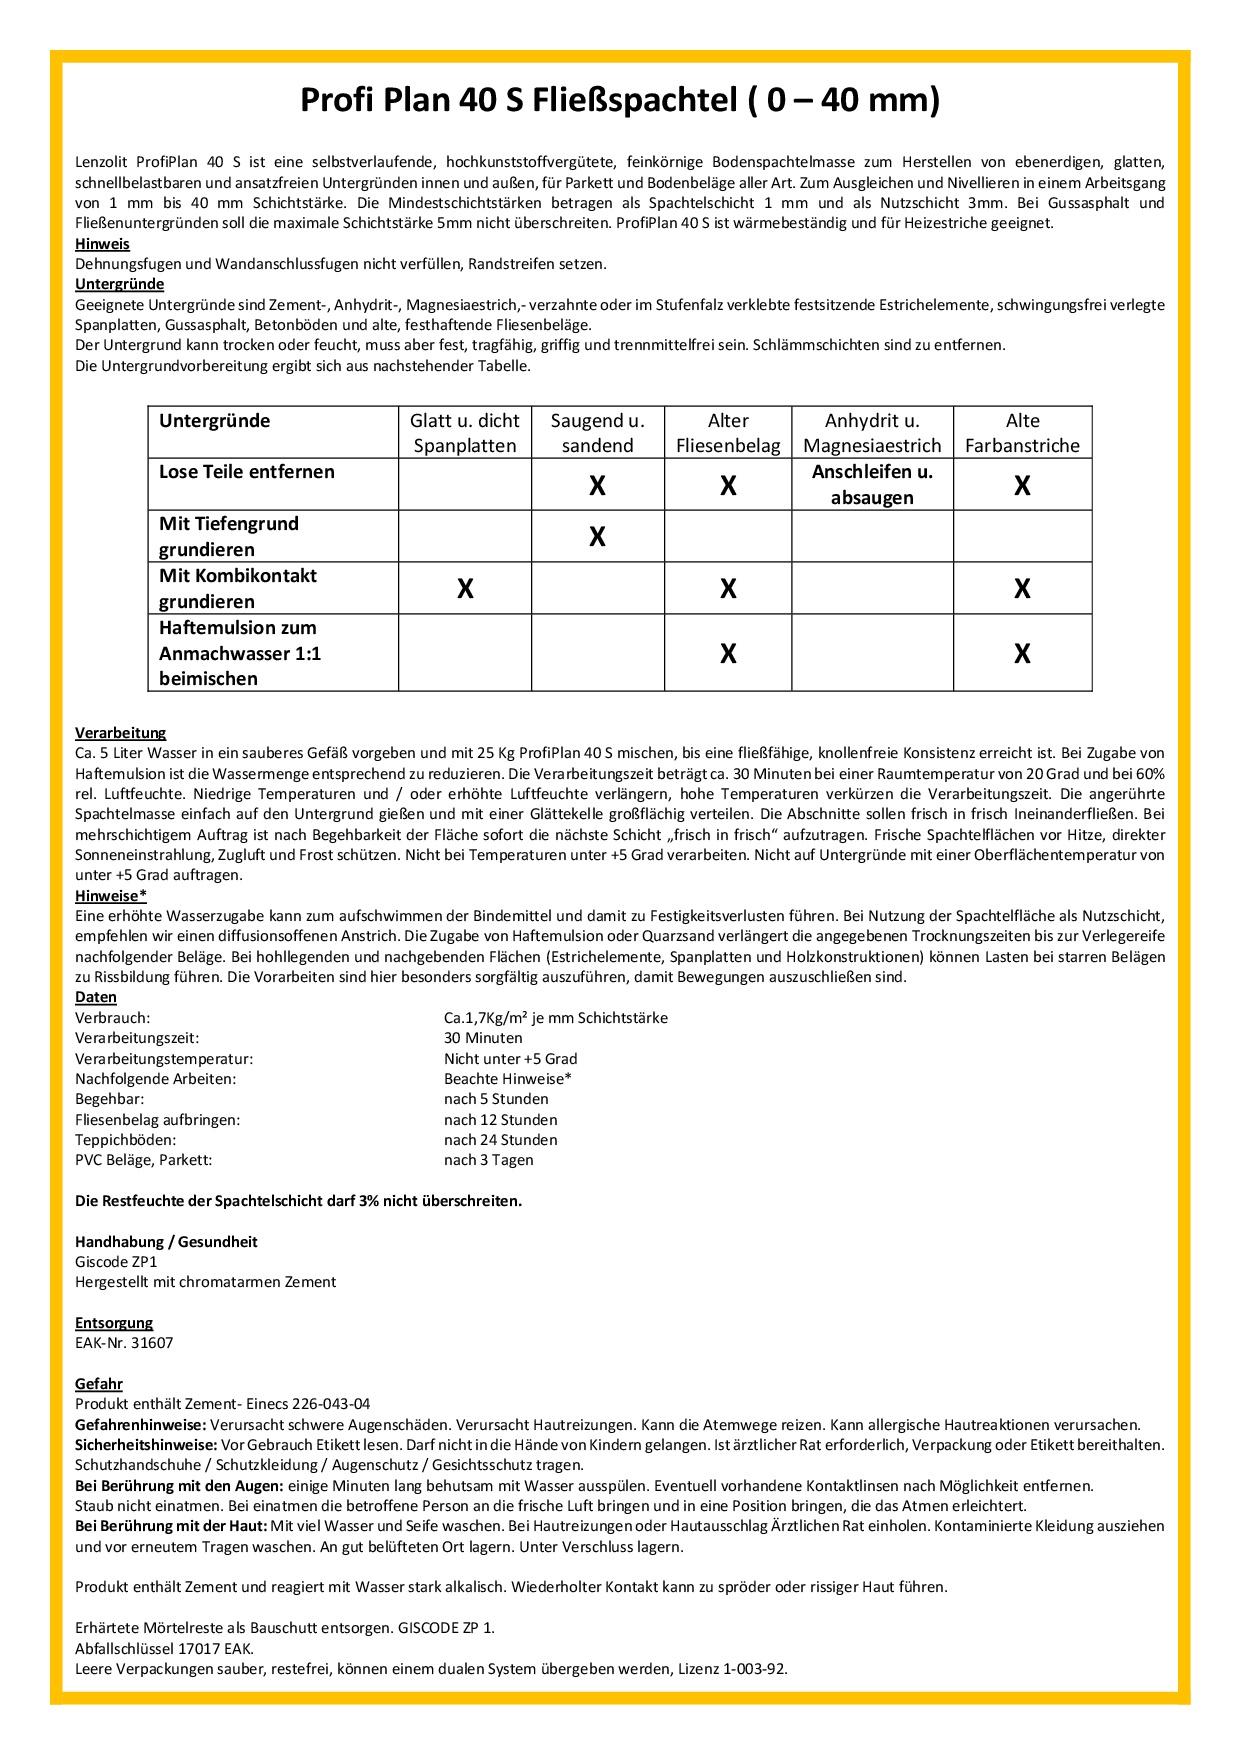 Datenblatt-Profiplan-40-S